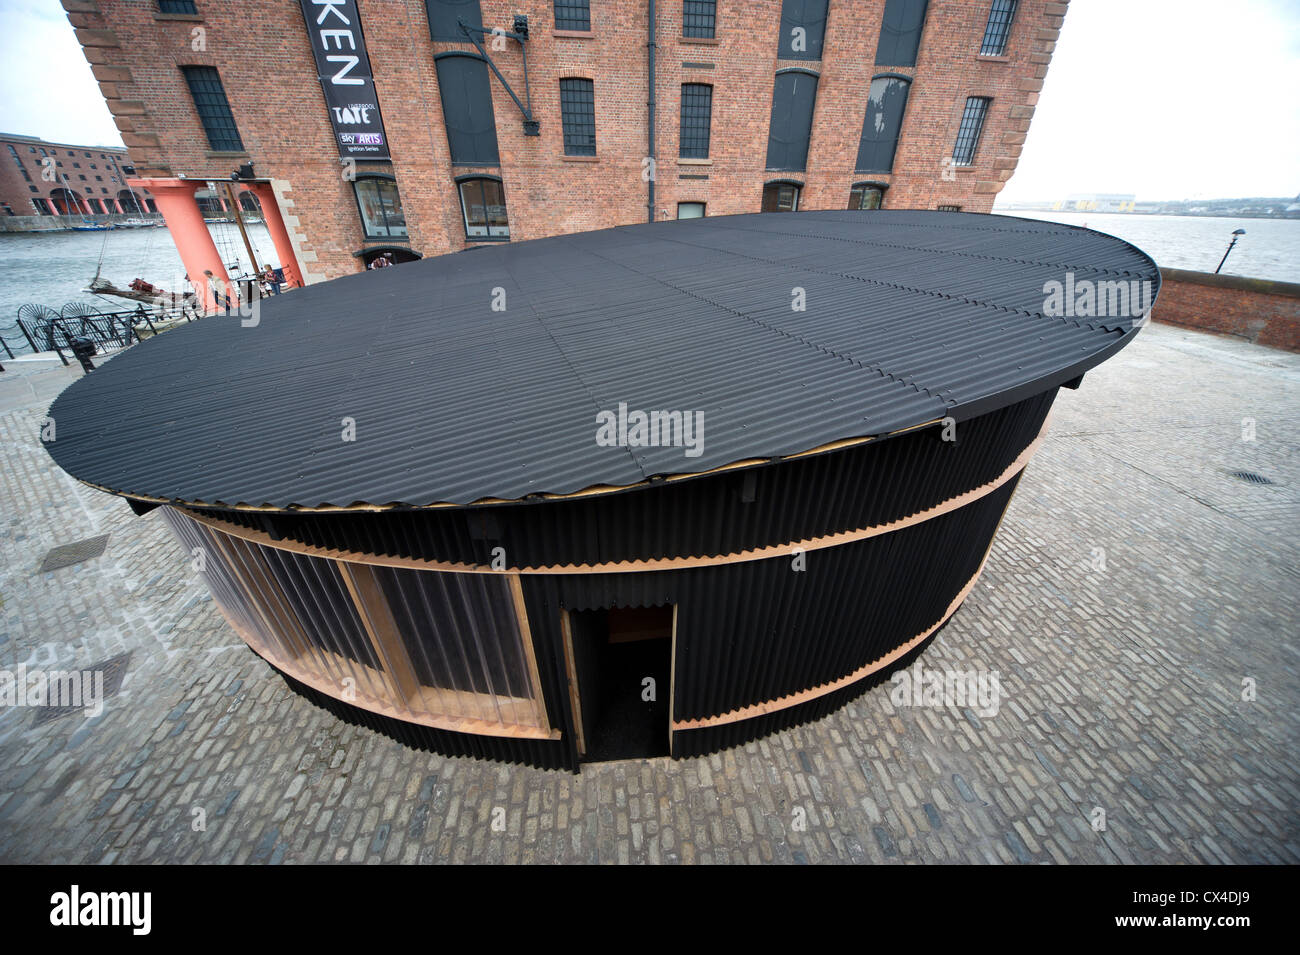 Designed by architect to the stars David Adjaye, this pavillion hosts Doug Aitken's new art installation Source. - Stock Image